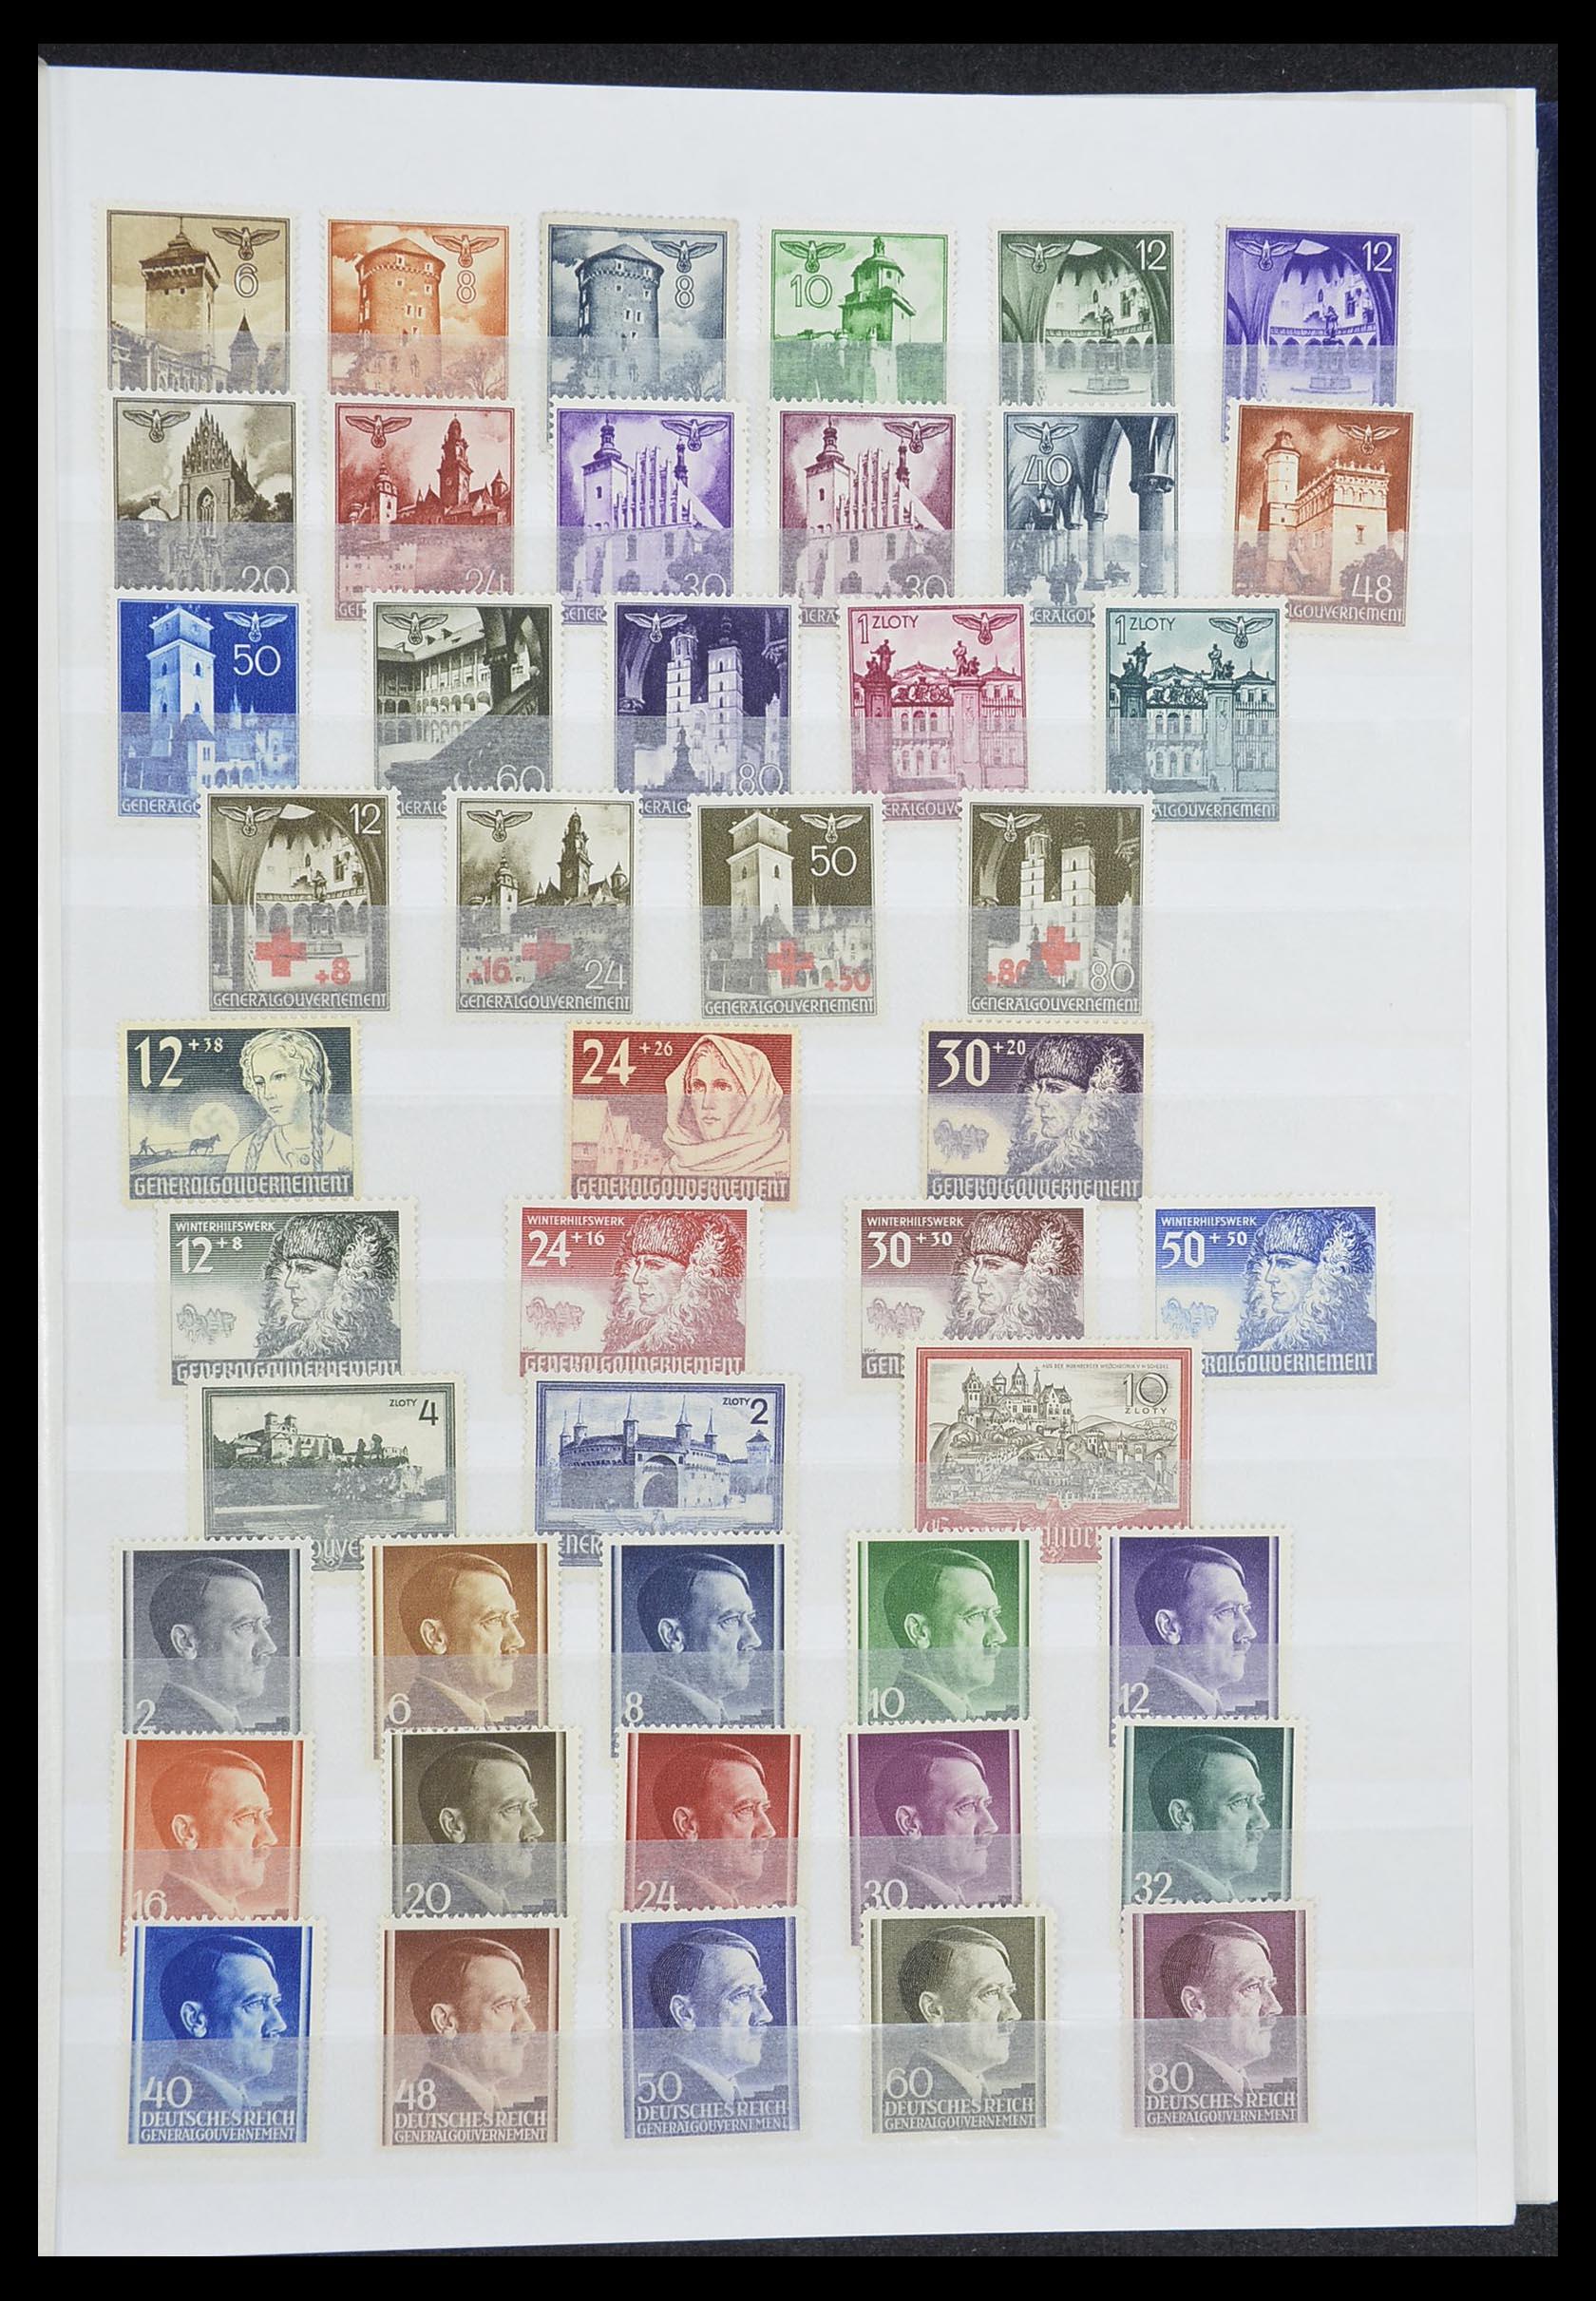 33850 002 - Postzegelverzameling 33850 Duitse bezettingen 2e wereldoorlog 1939-19